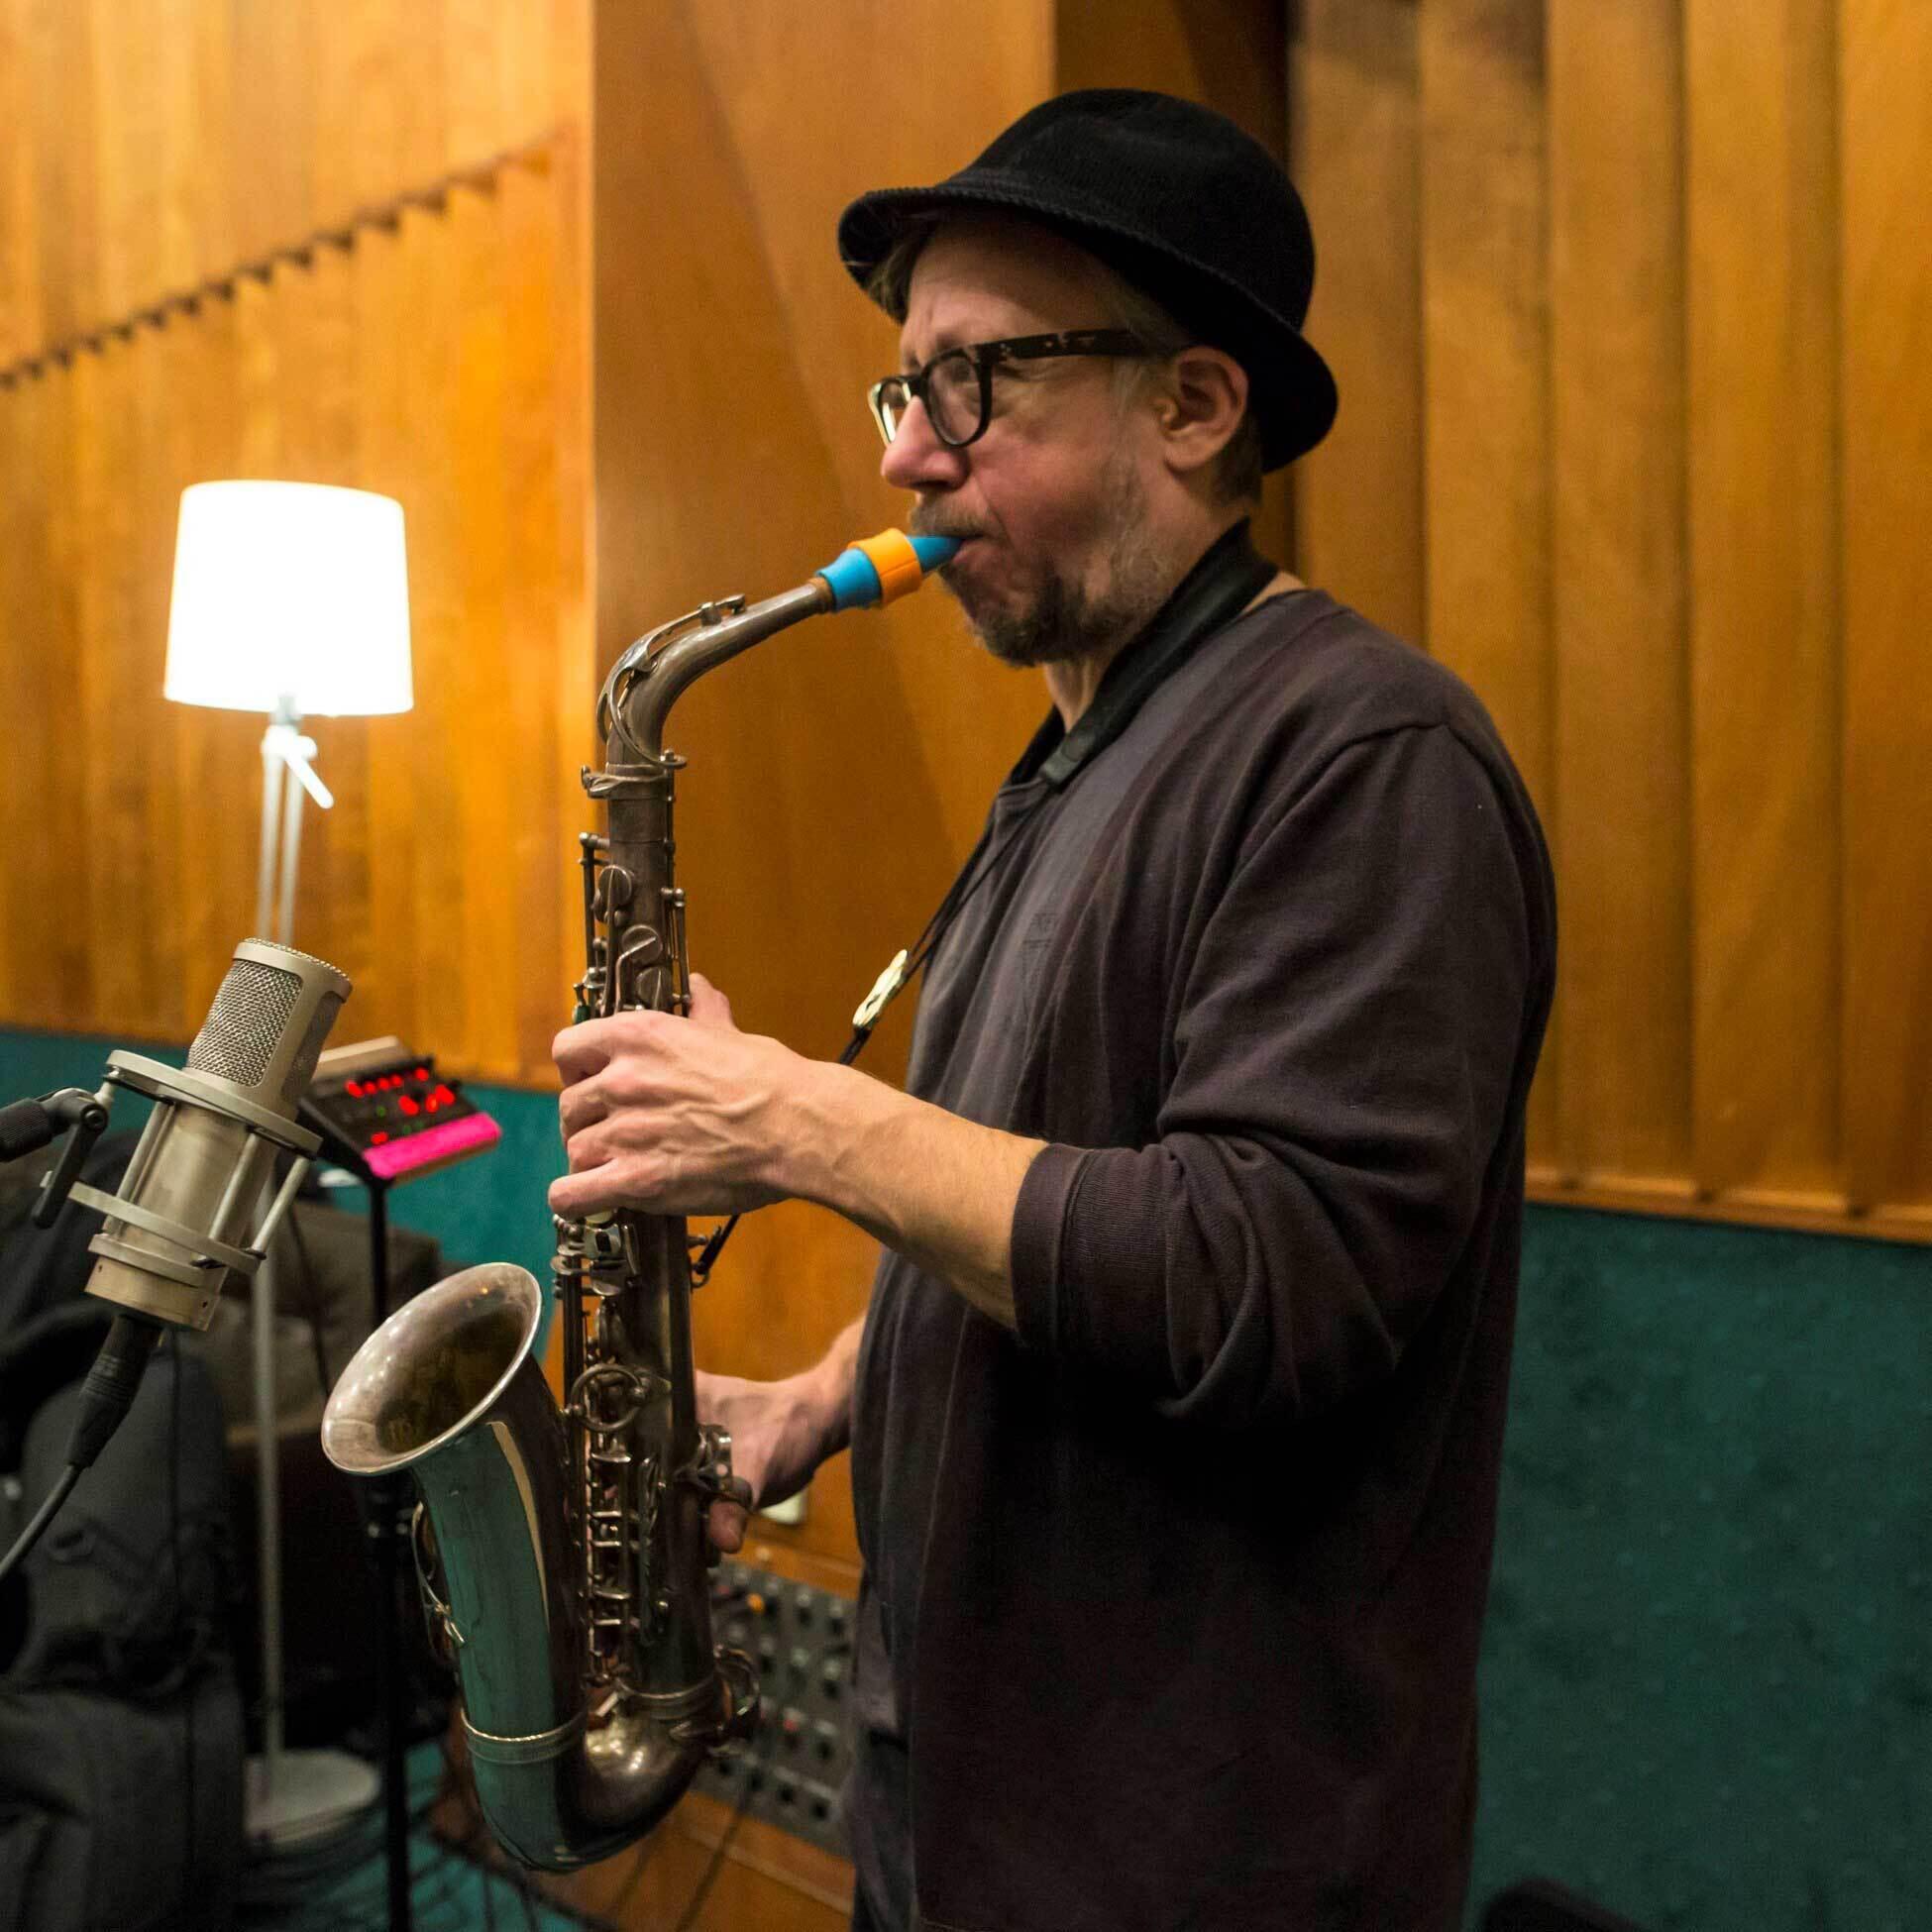 Dimitris Tsakas plays a Syos saxophone mouthpiece